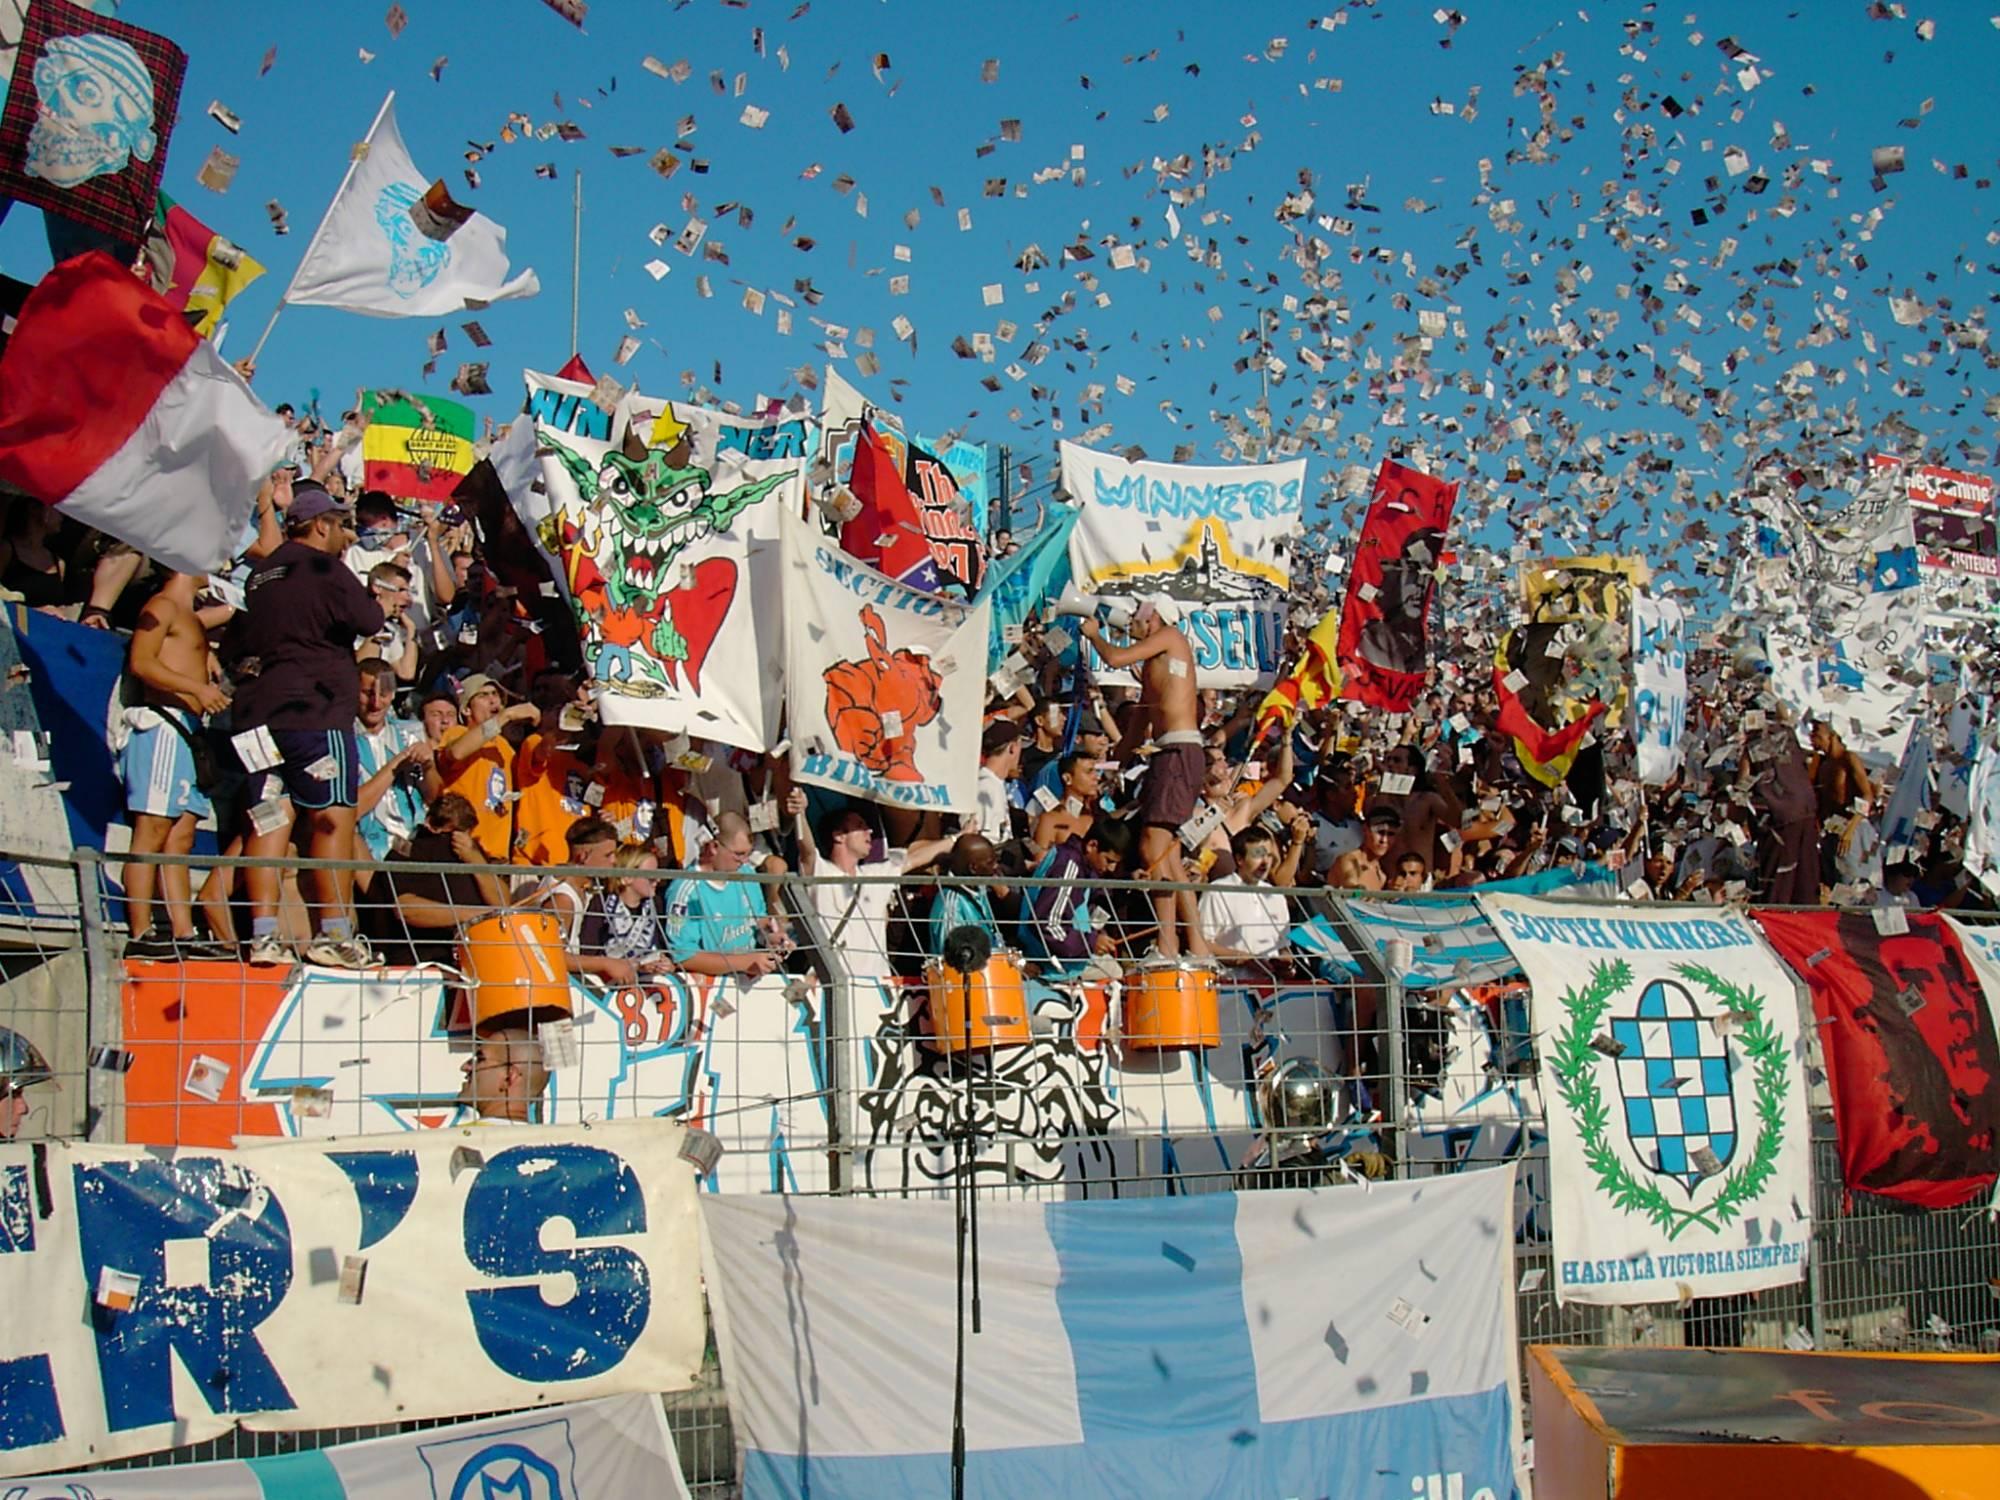 Guingamp-OM saison 2003/2004